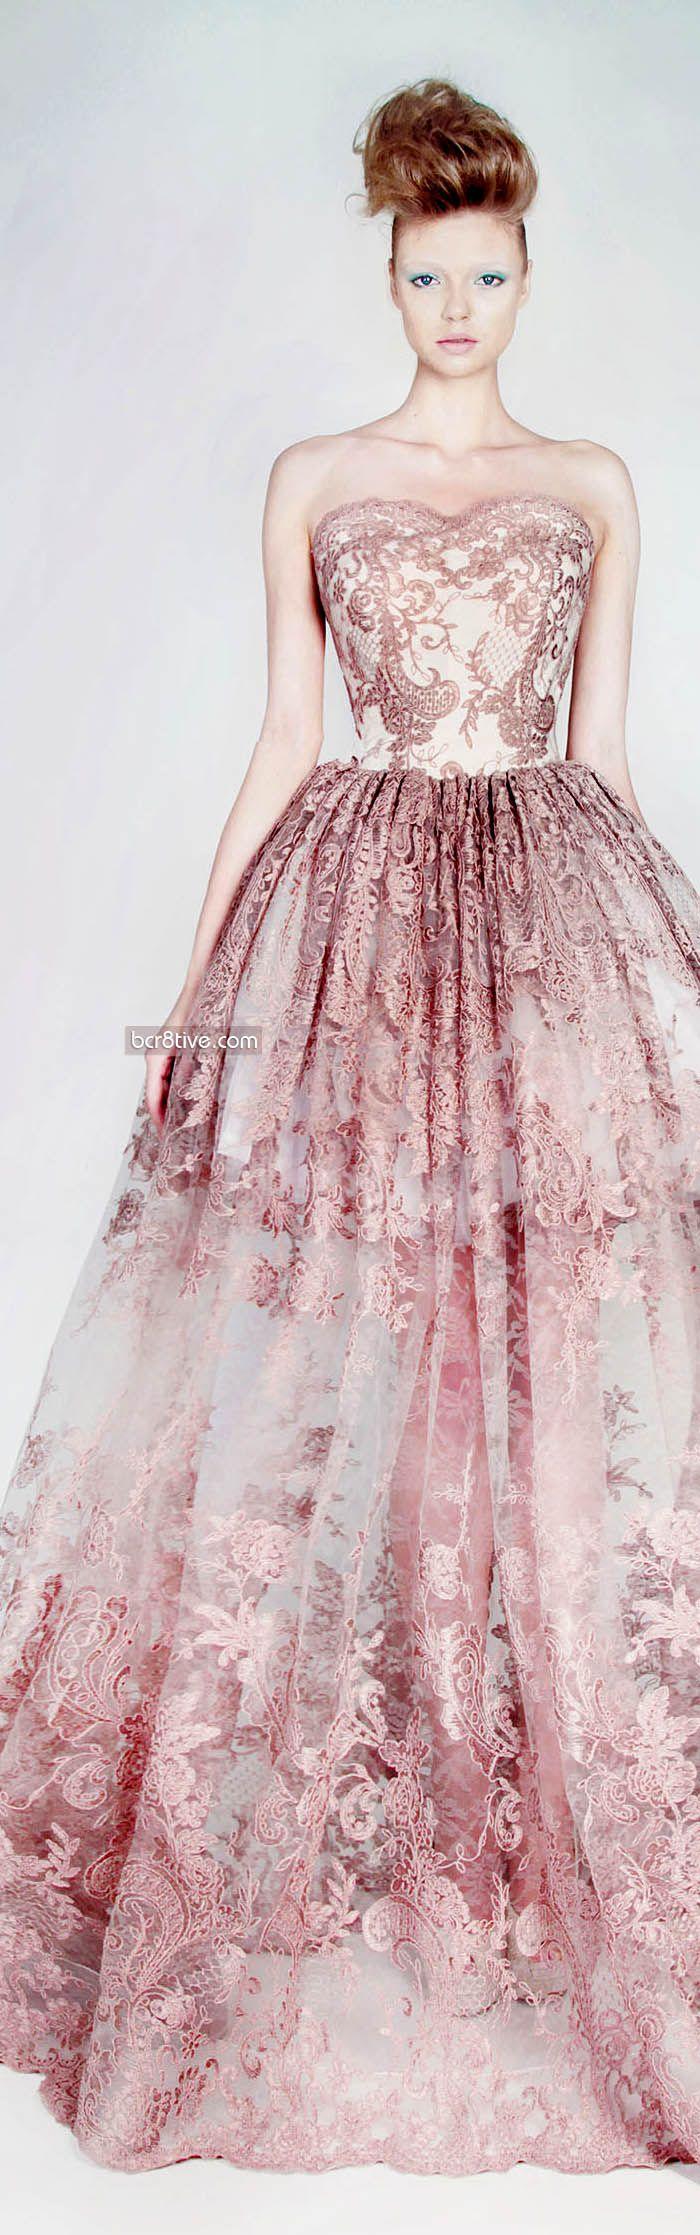 Rami Kadi Les Jardins Suspendus | Princesas, Vestiditos y Rosas